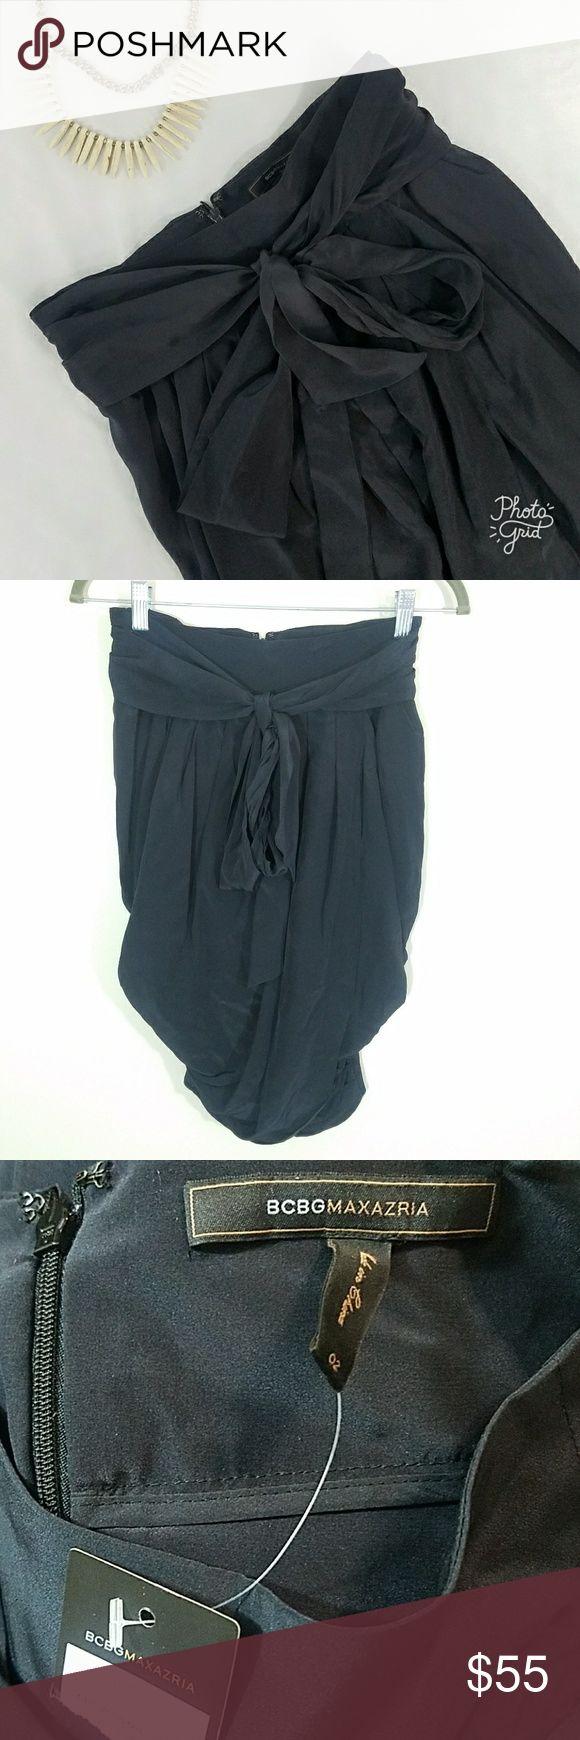 BCBGMAXAZRIA Tie Waist Tulip Silk Skirt w/ Pockets BCBG NWT skirt Tie waist skirt with pockets; tulip drape; 100% silk BCBGMaxAzria Skirts